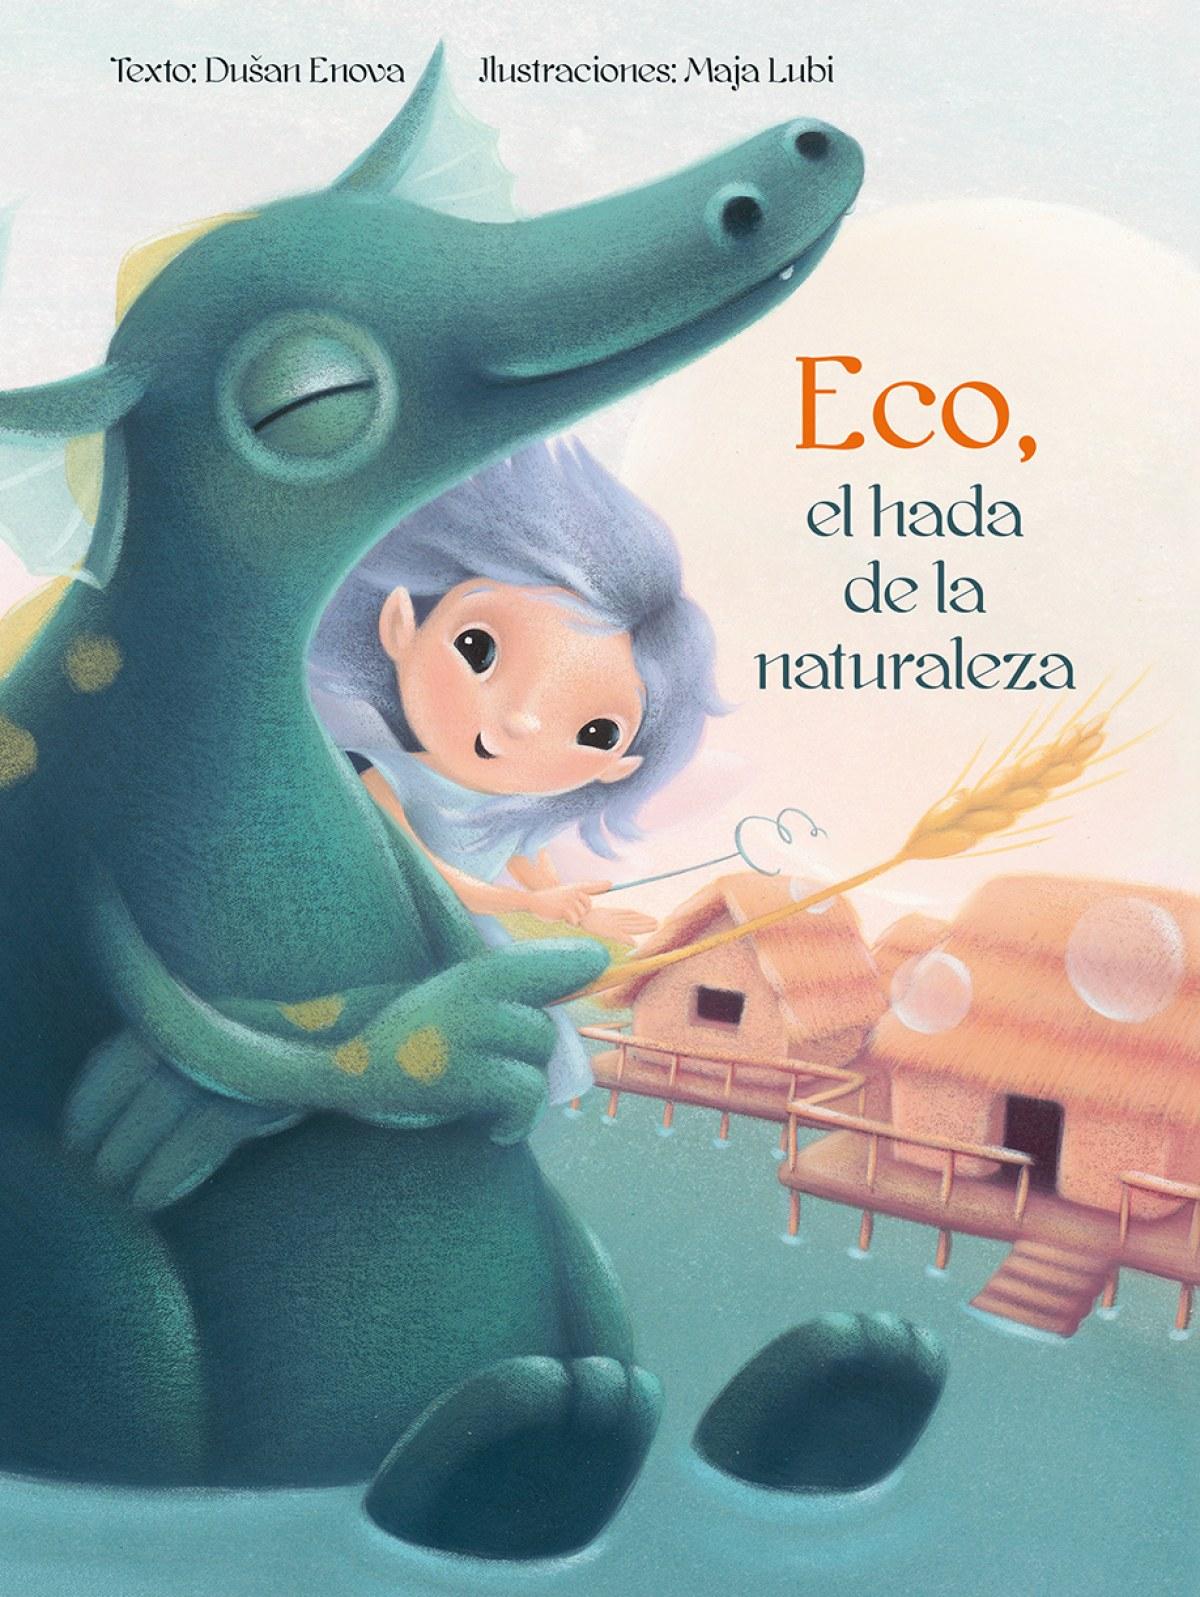 Eco, el hada de la naturaleza - Enova-lubi, Dusan-maja